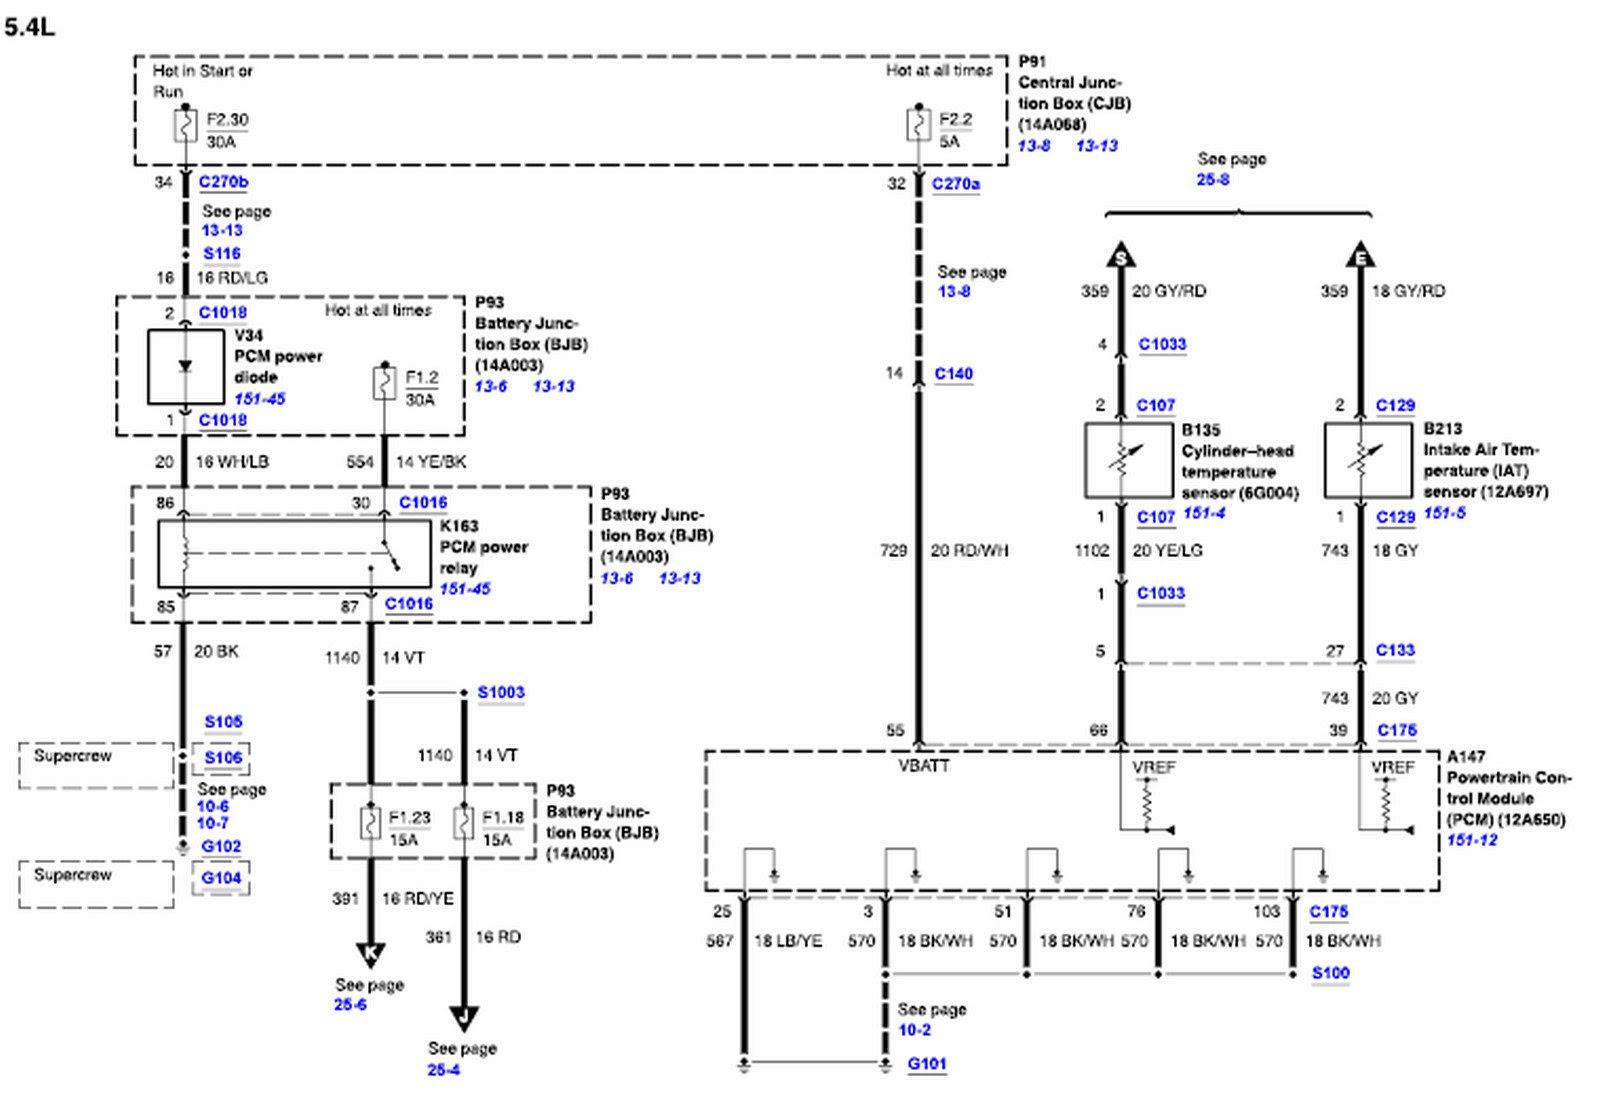 Firewall 2006 Pt Cruiser Wiring Diagram Wiring Diagram Local1 Local1 Maceratadoc It